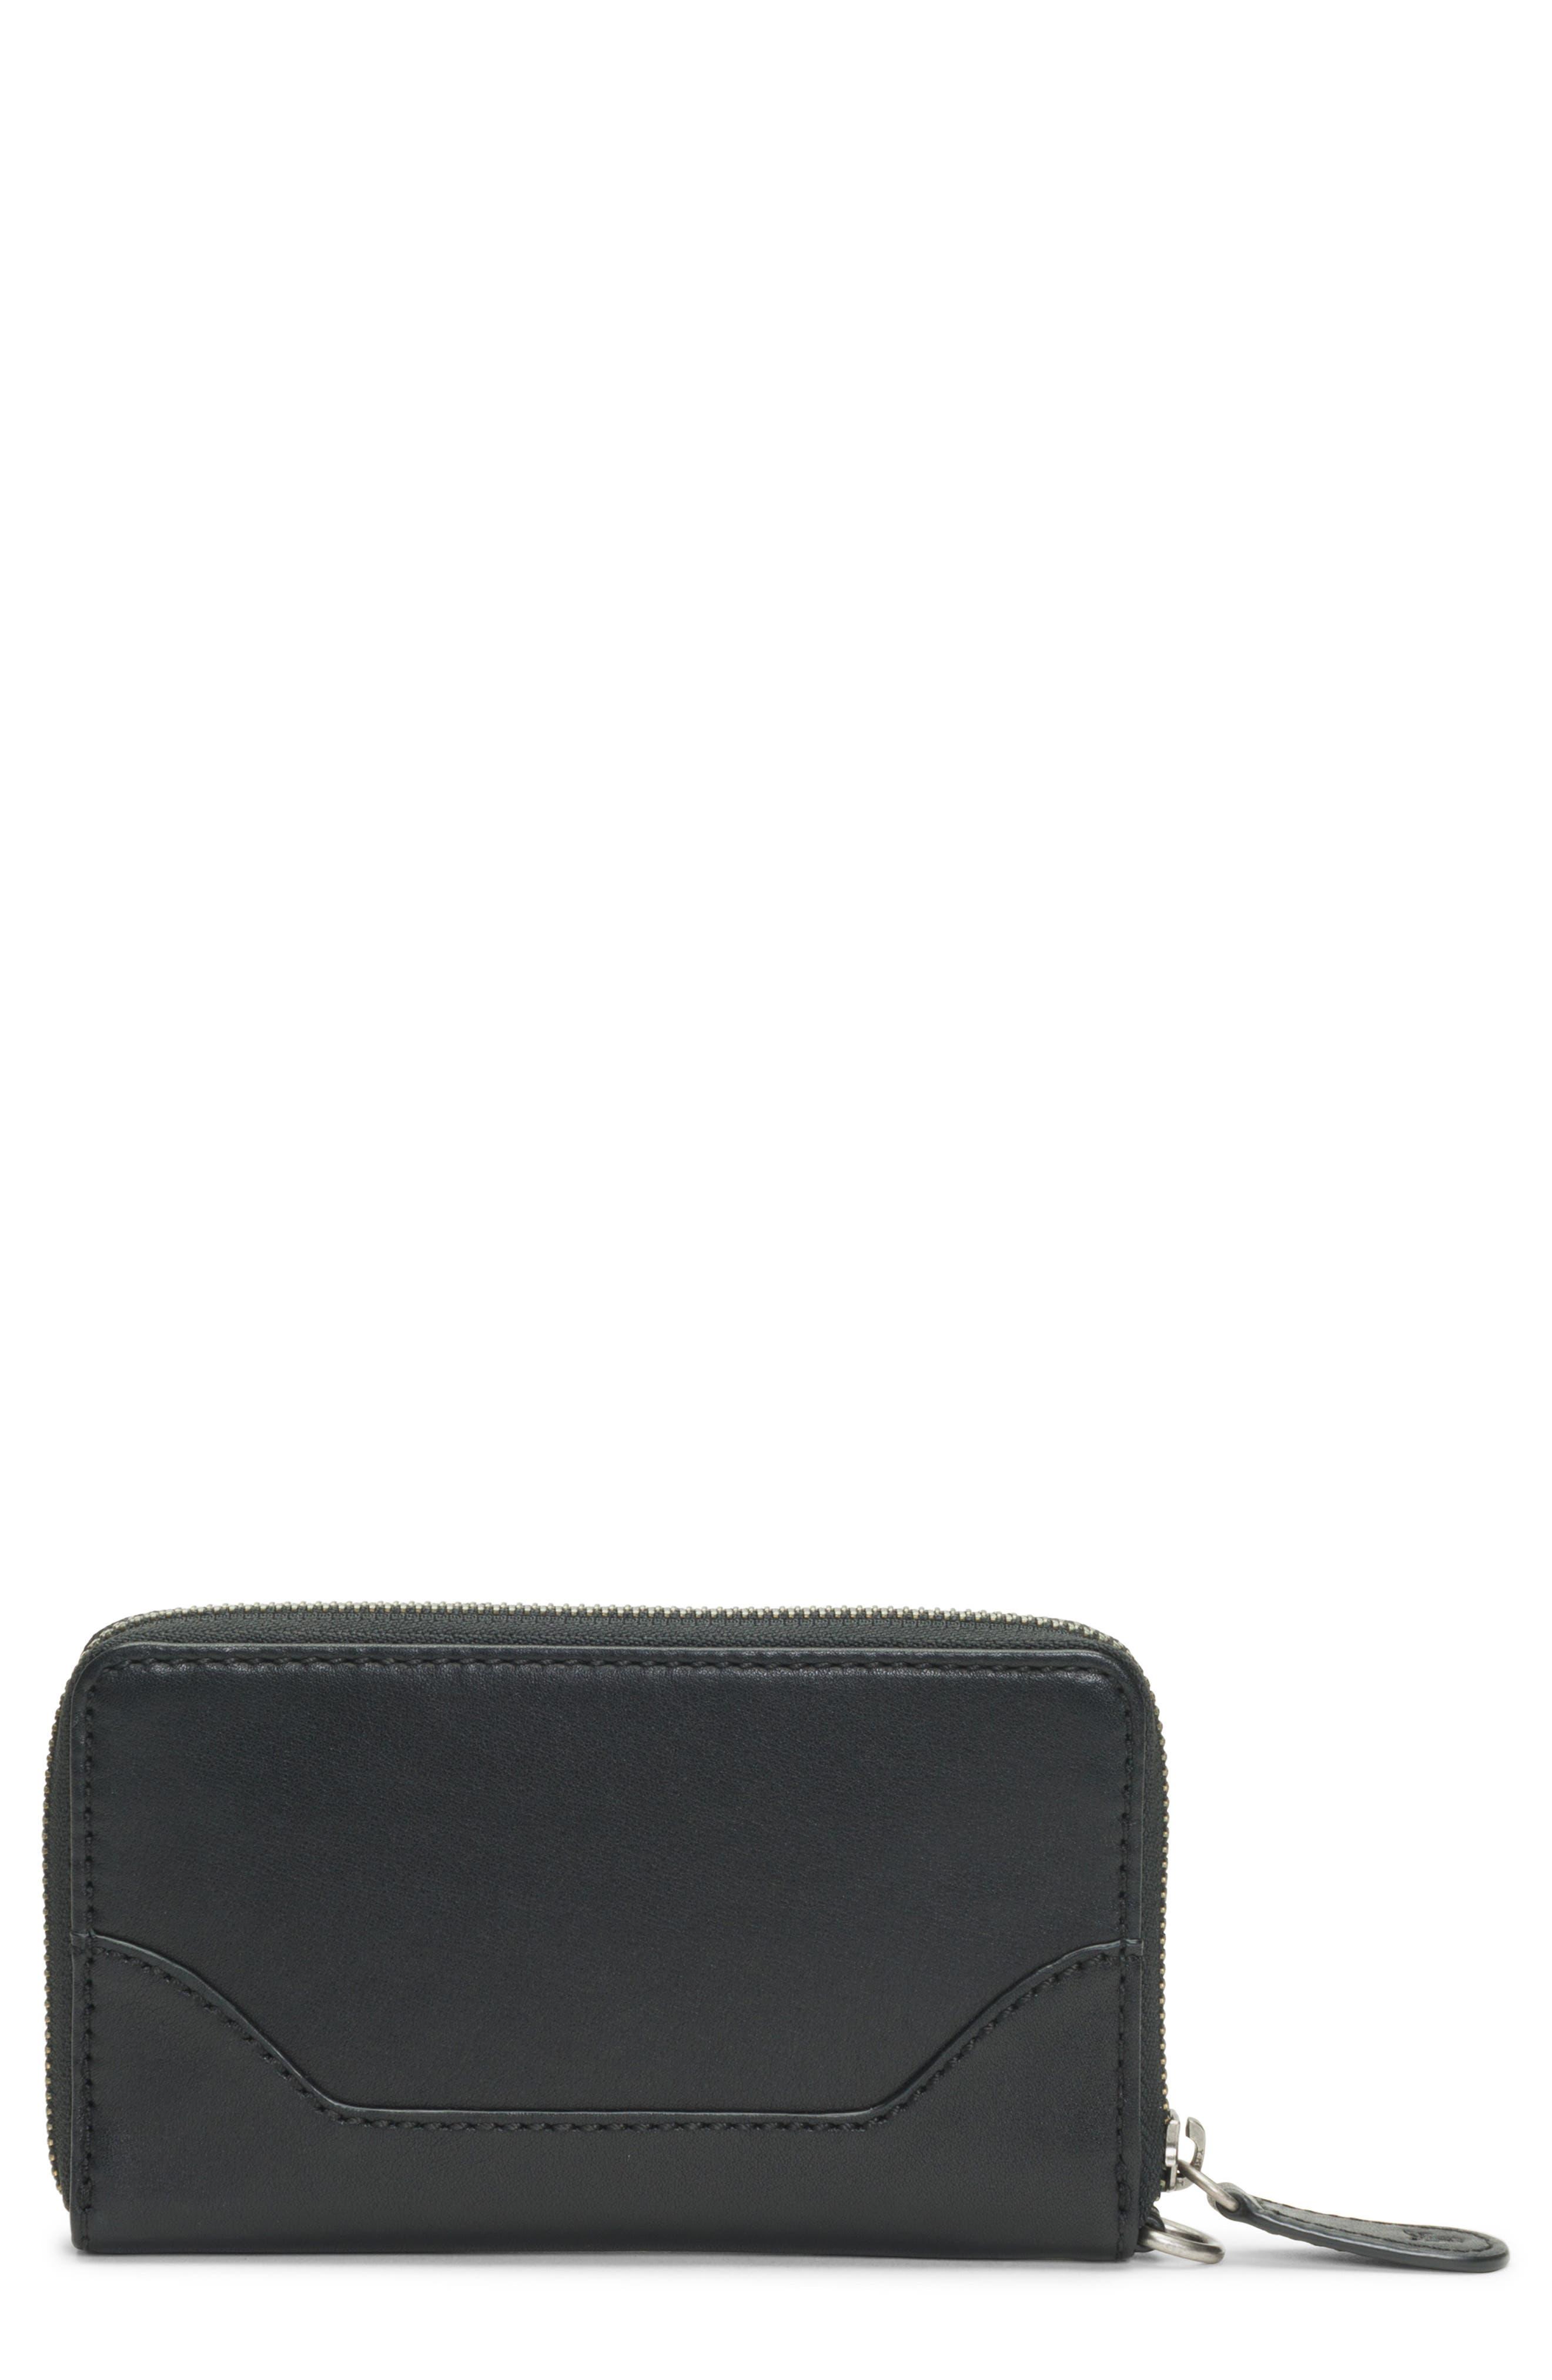 Melissa Leather Phone Wallet,                             Main thumbnail 1, color,                             BLACK